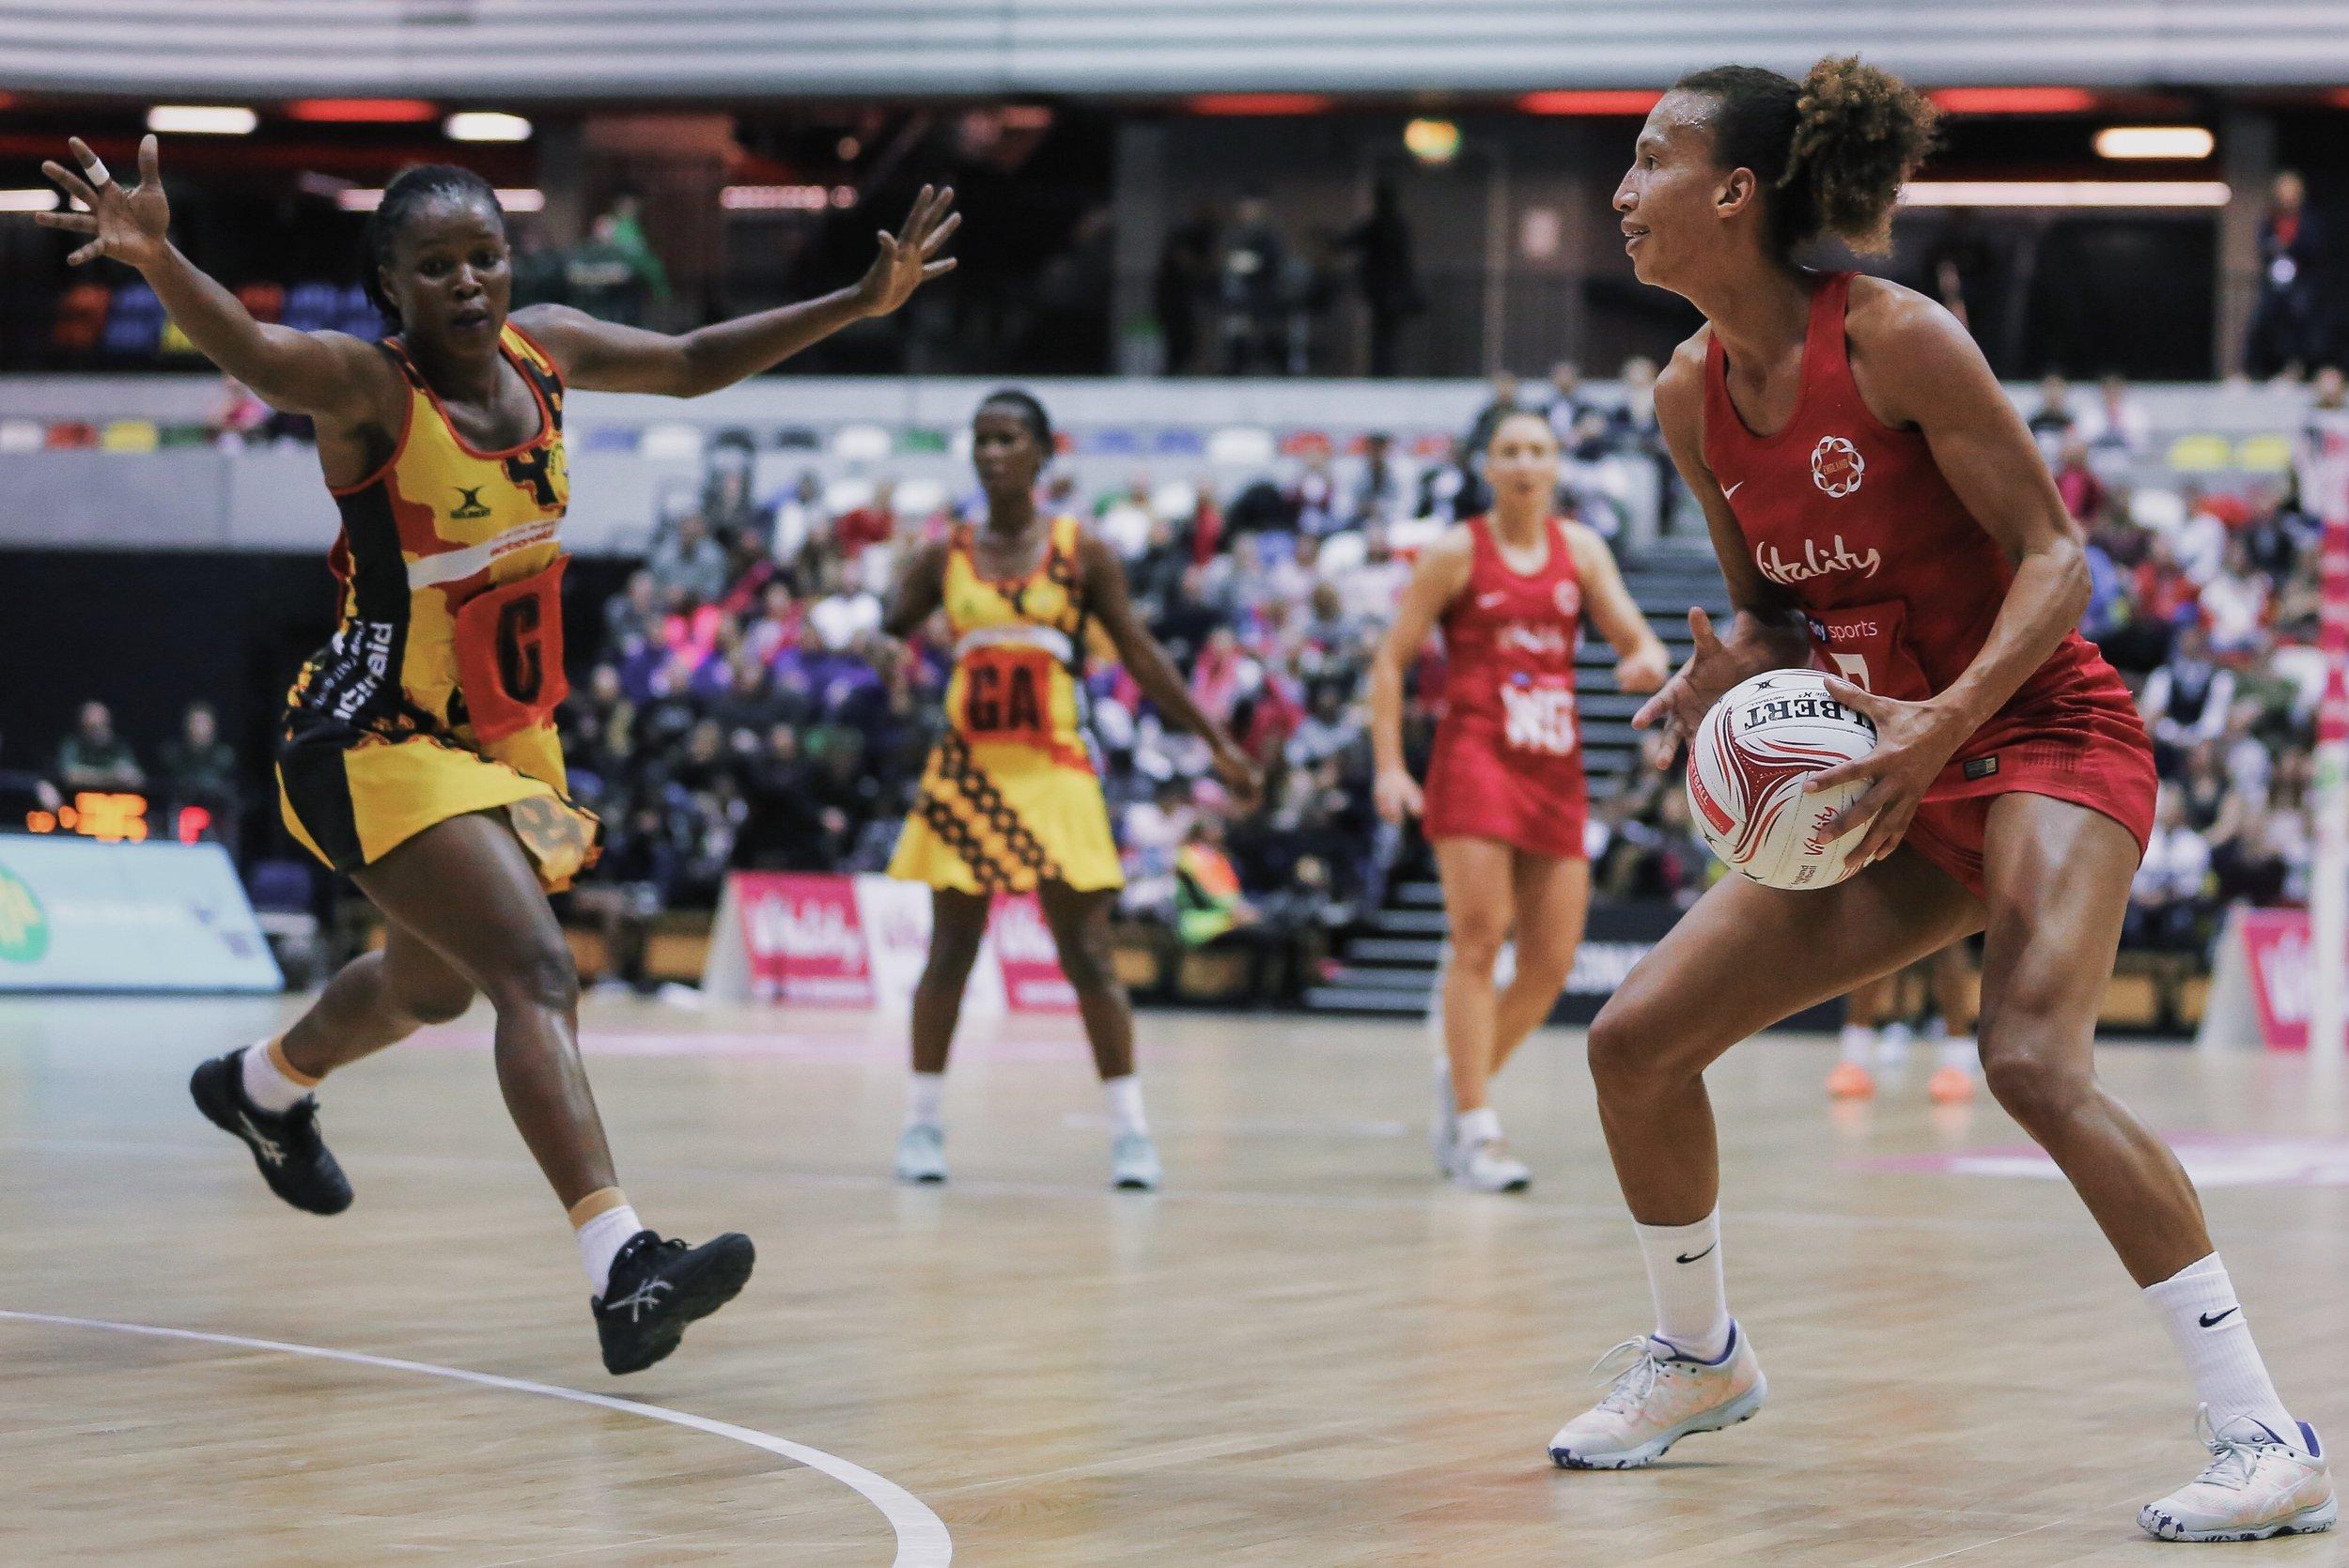 womens-netball-sport-england-uganda-international-series-15.jpg